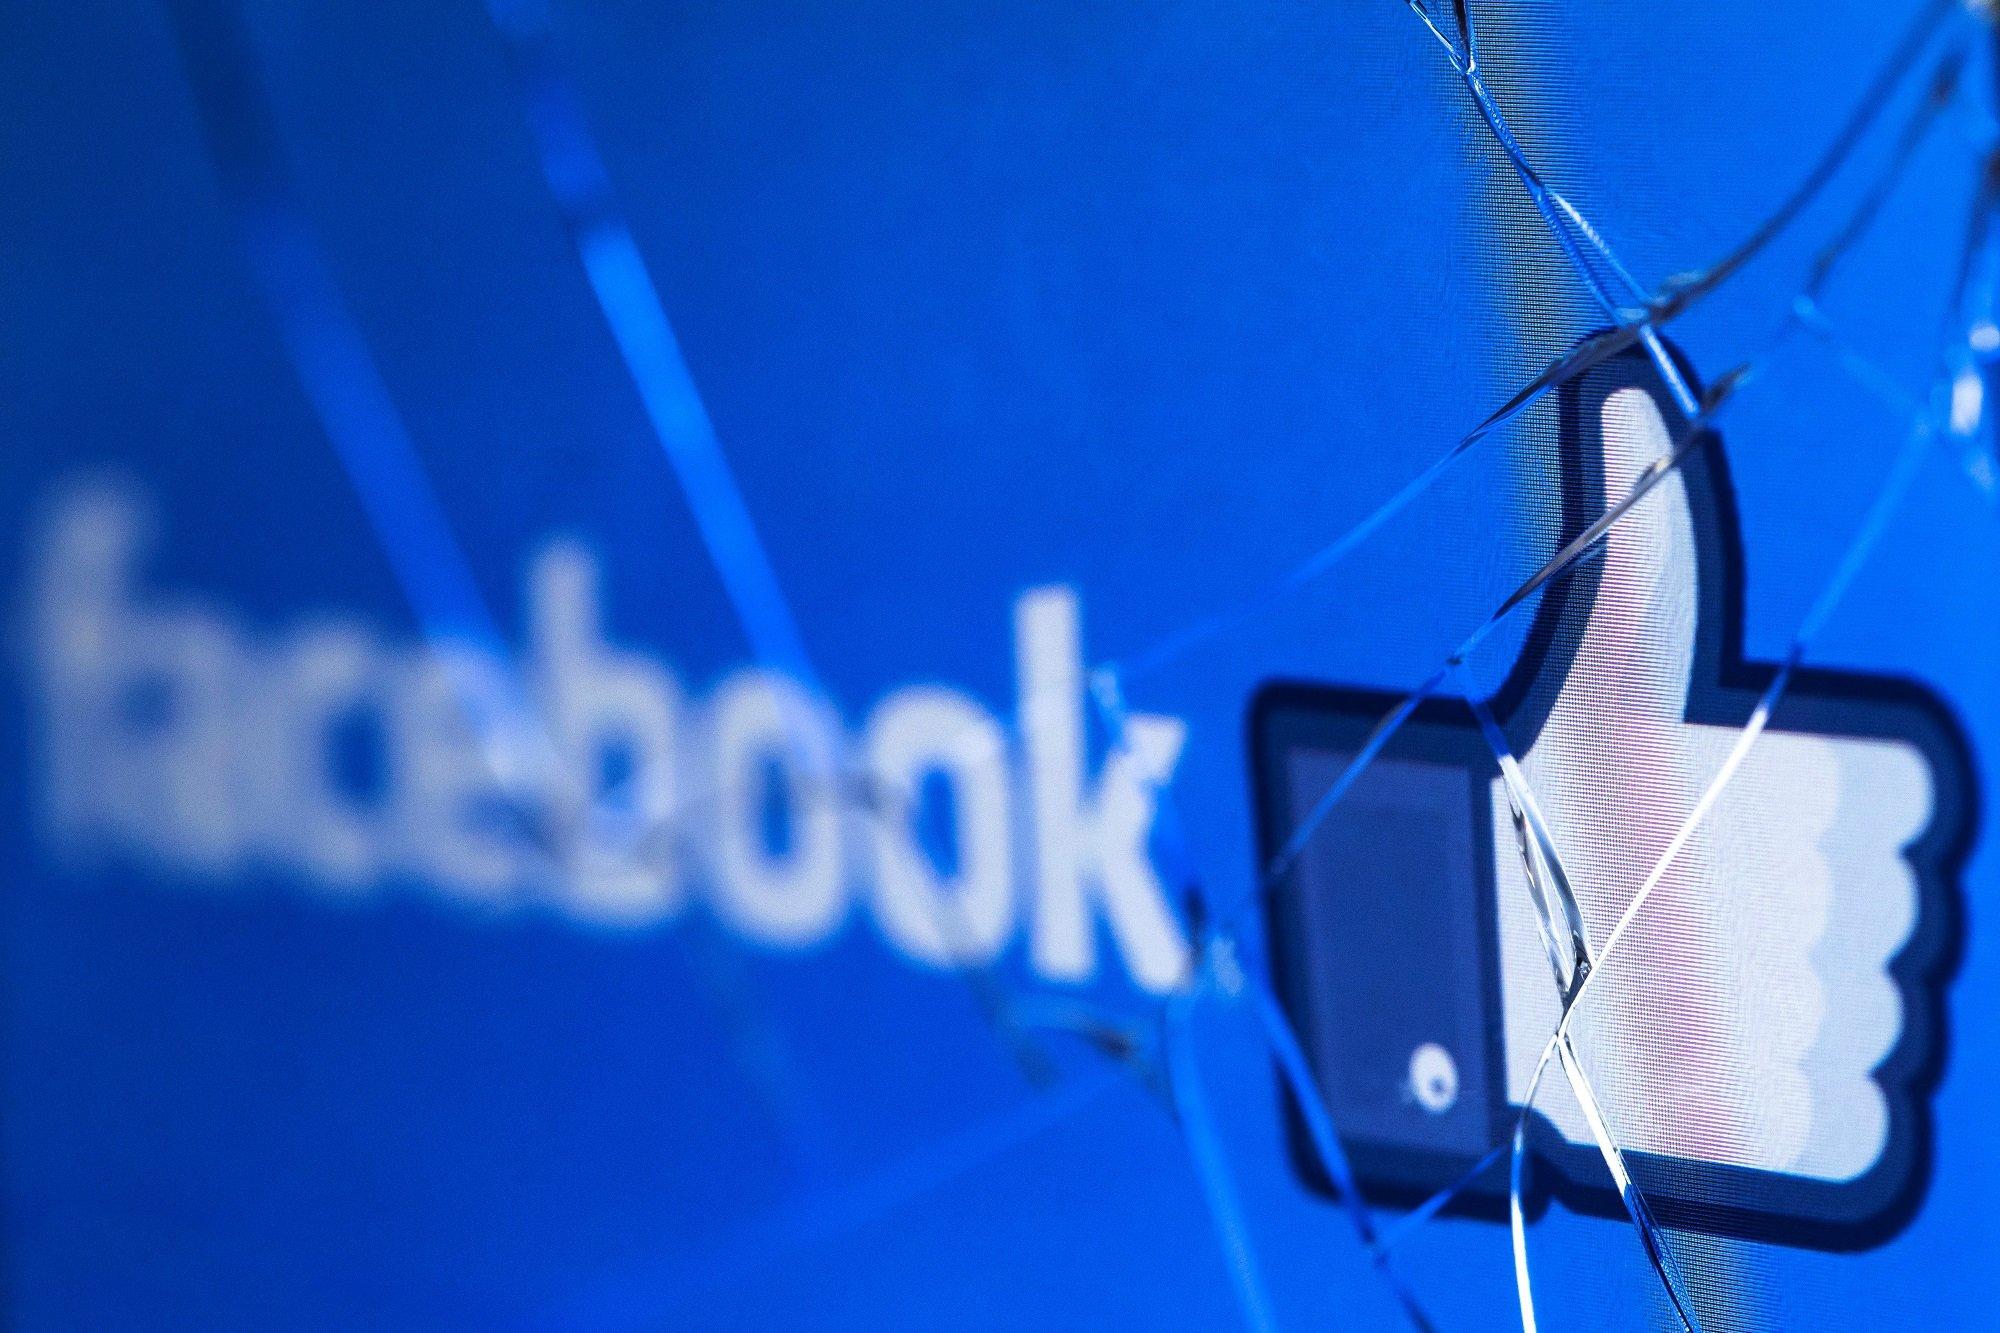 Facebook Breaking Up فیسبوک ۵ ماه قبل از حادثه کنگره در جریان خشونت در گروهها بود، ولی اقدامی نکرد اخبار IT